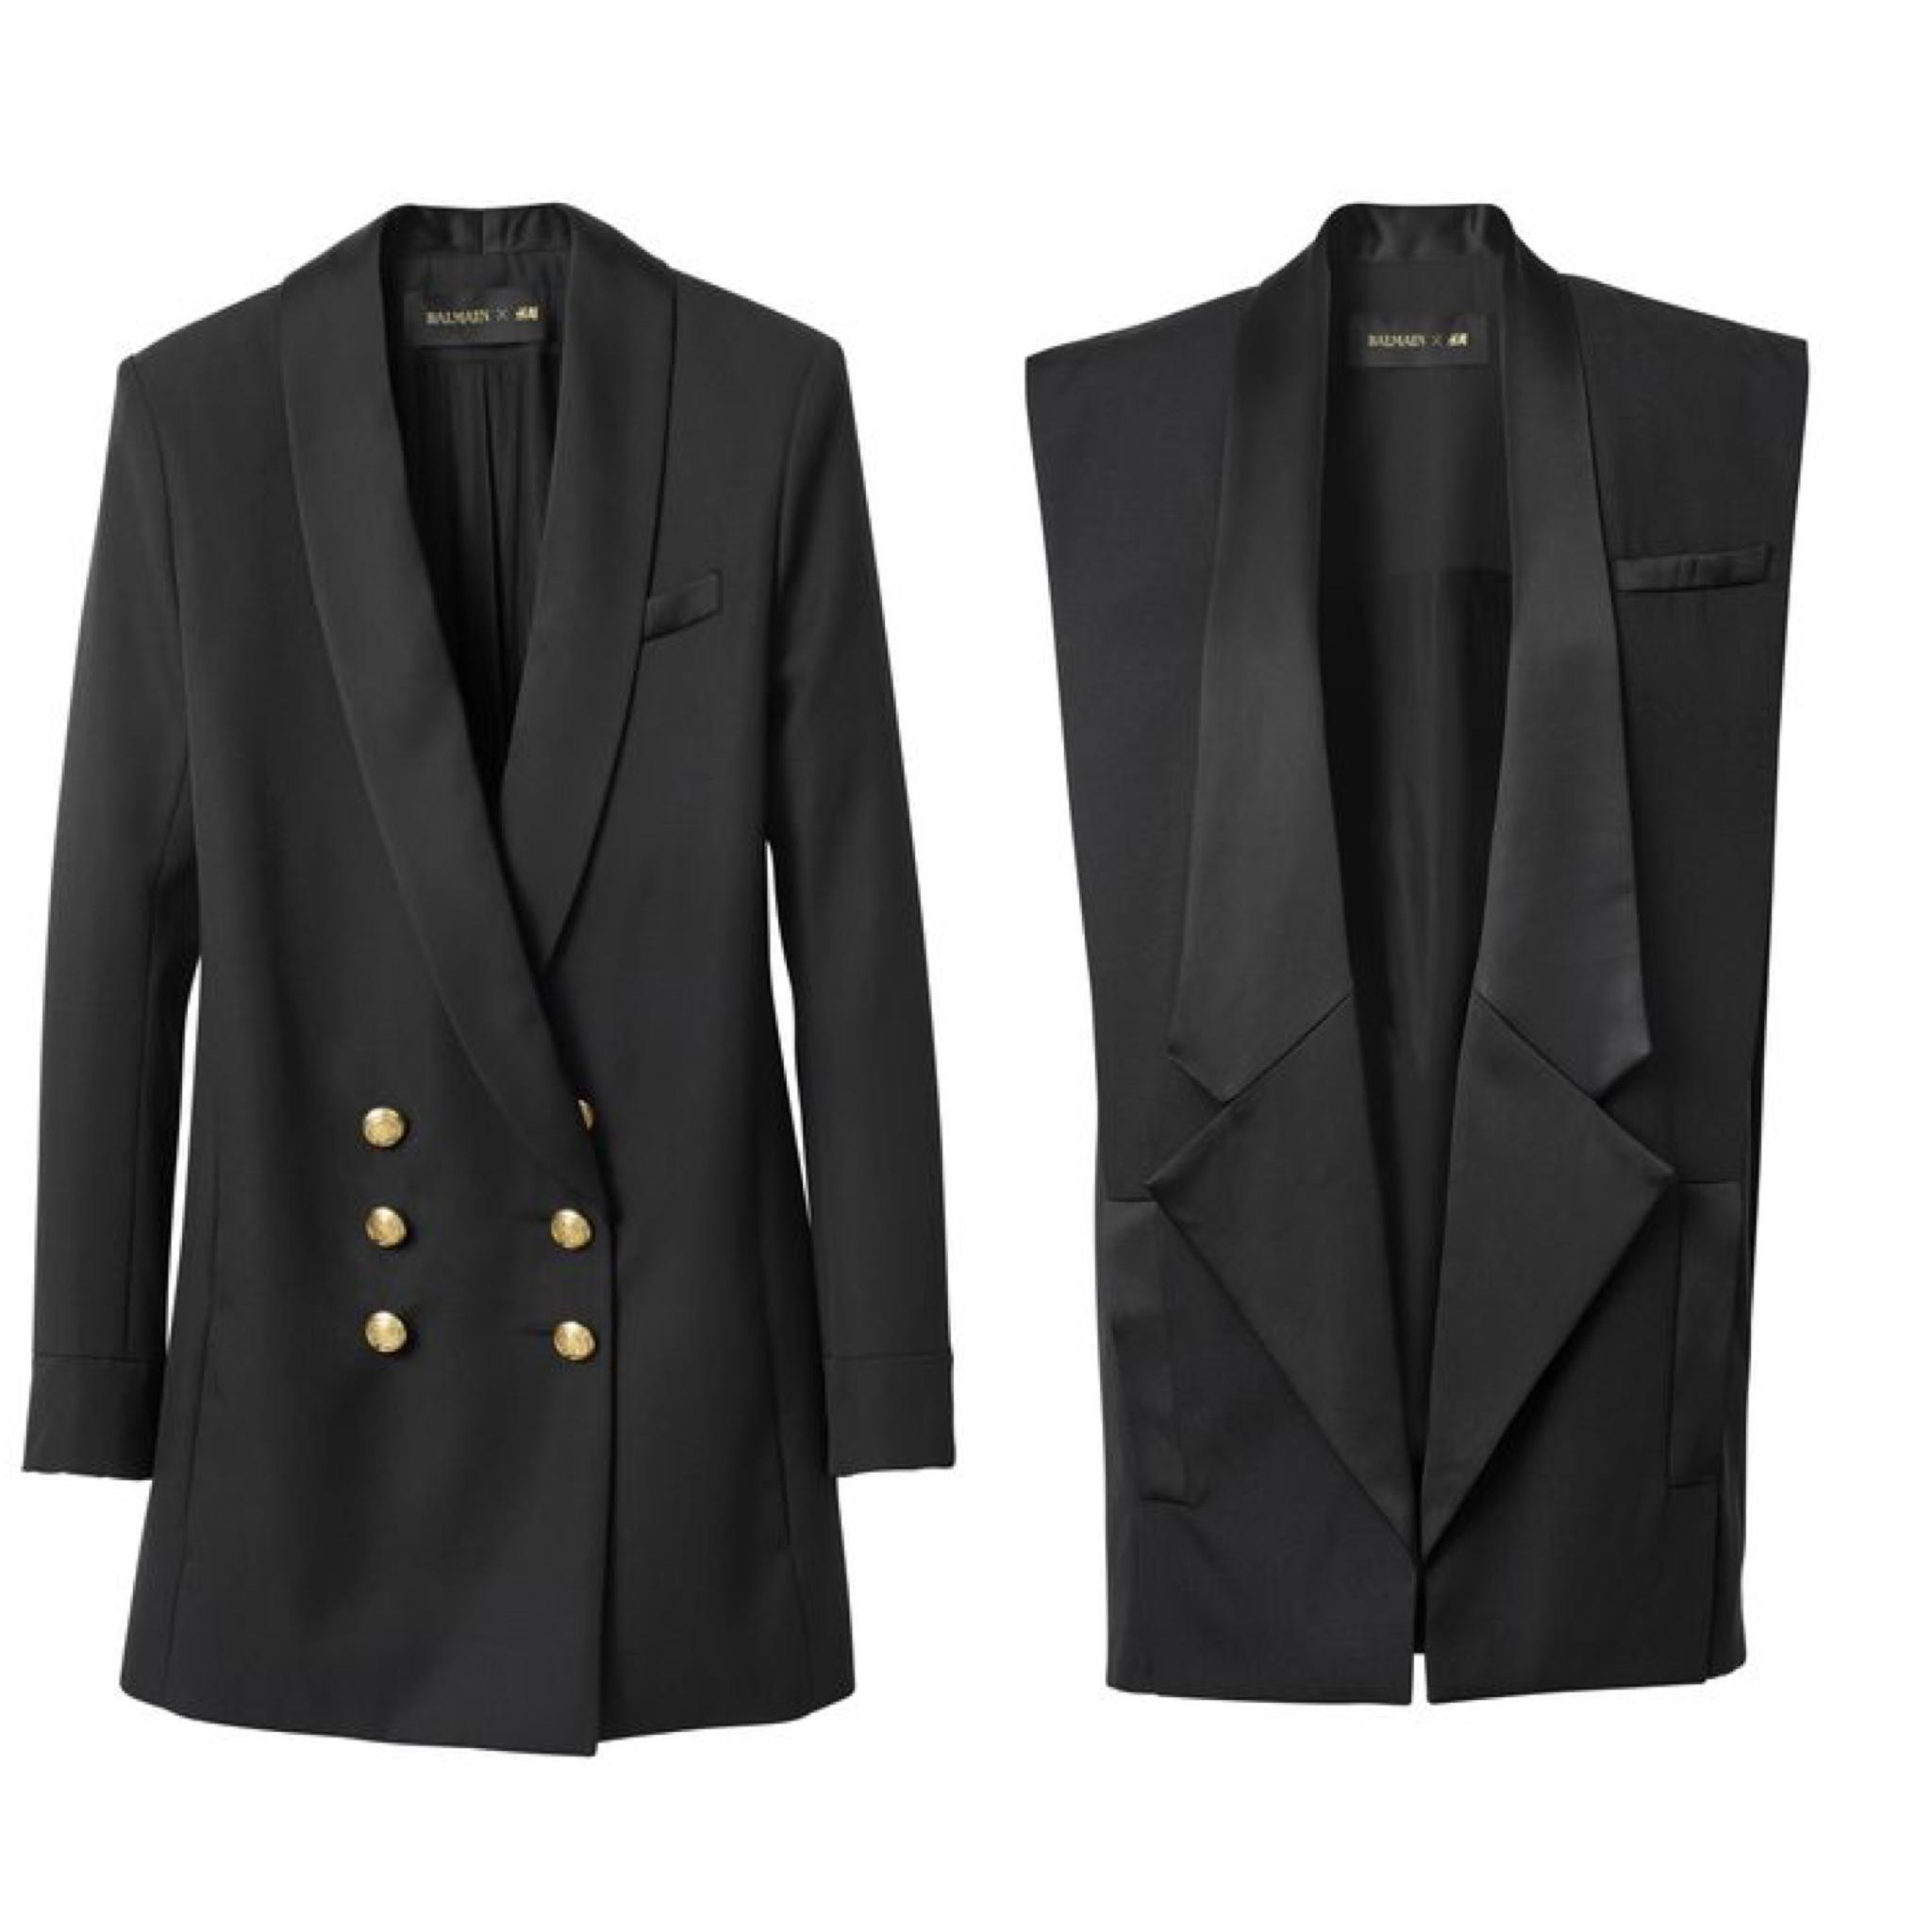 Balmain H&M blazer sleeveless vest